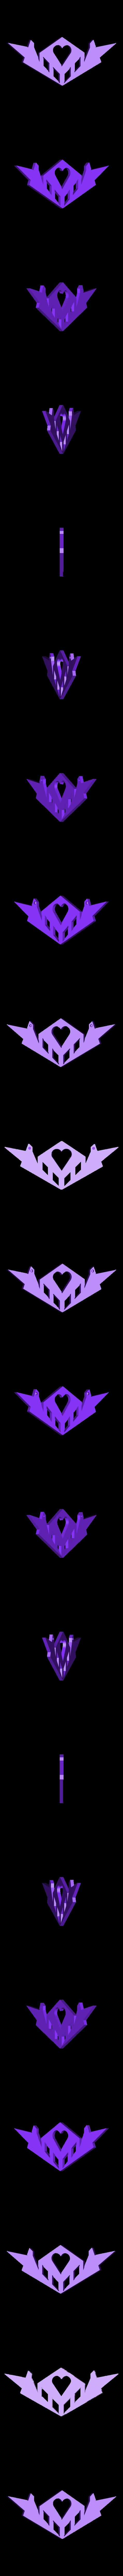 pendant (heart) vyrezane.stl Download free STL file Pendants • Design to 3D print, Amador